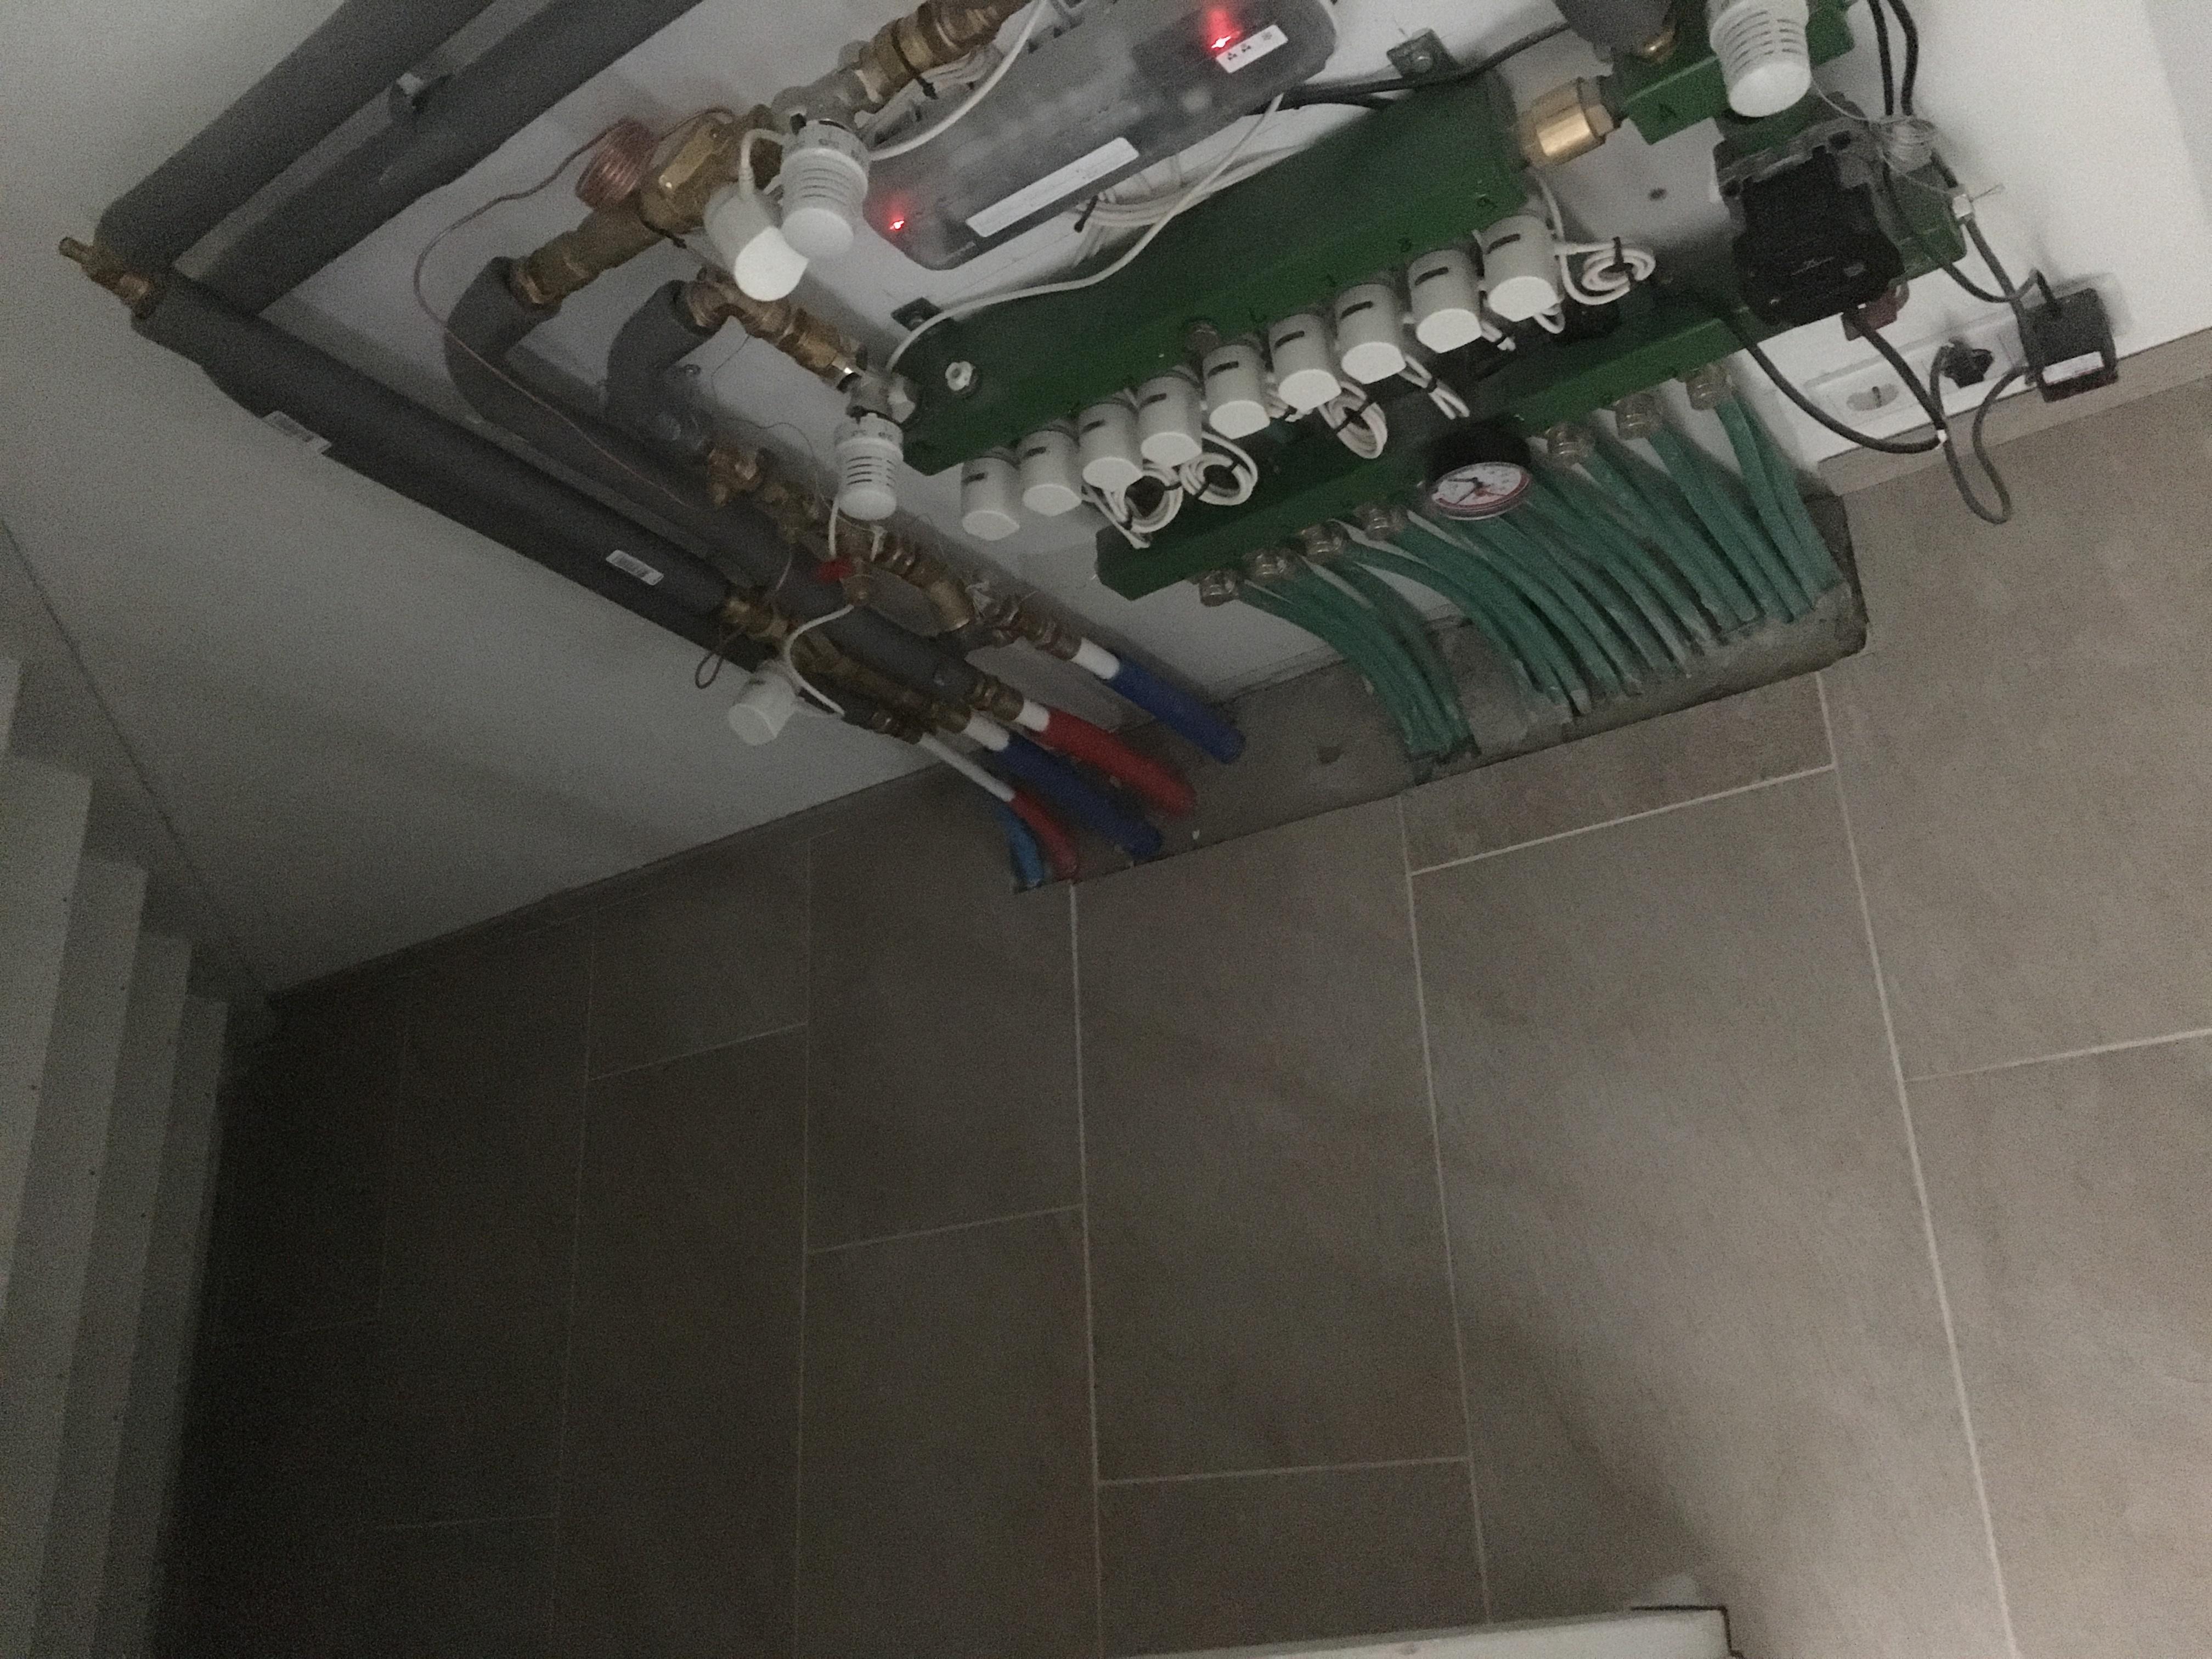 Vloerverwarming Badkamer Retourleiding : Vloerverwarming badkamer radiator verkeerd aangesloten wonen